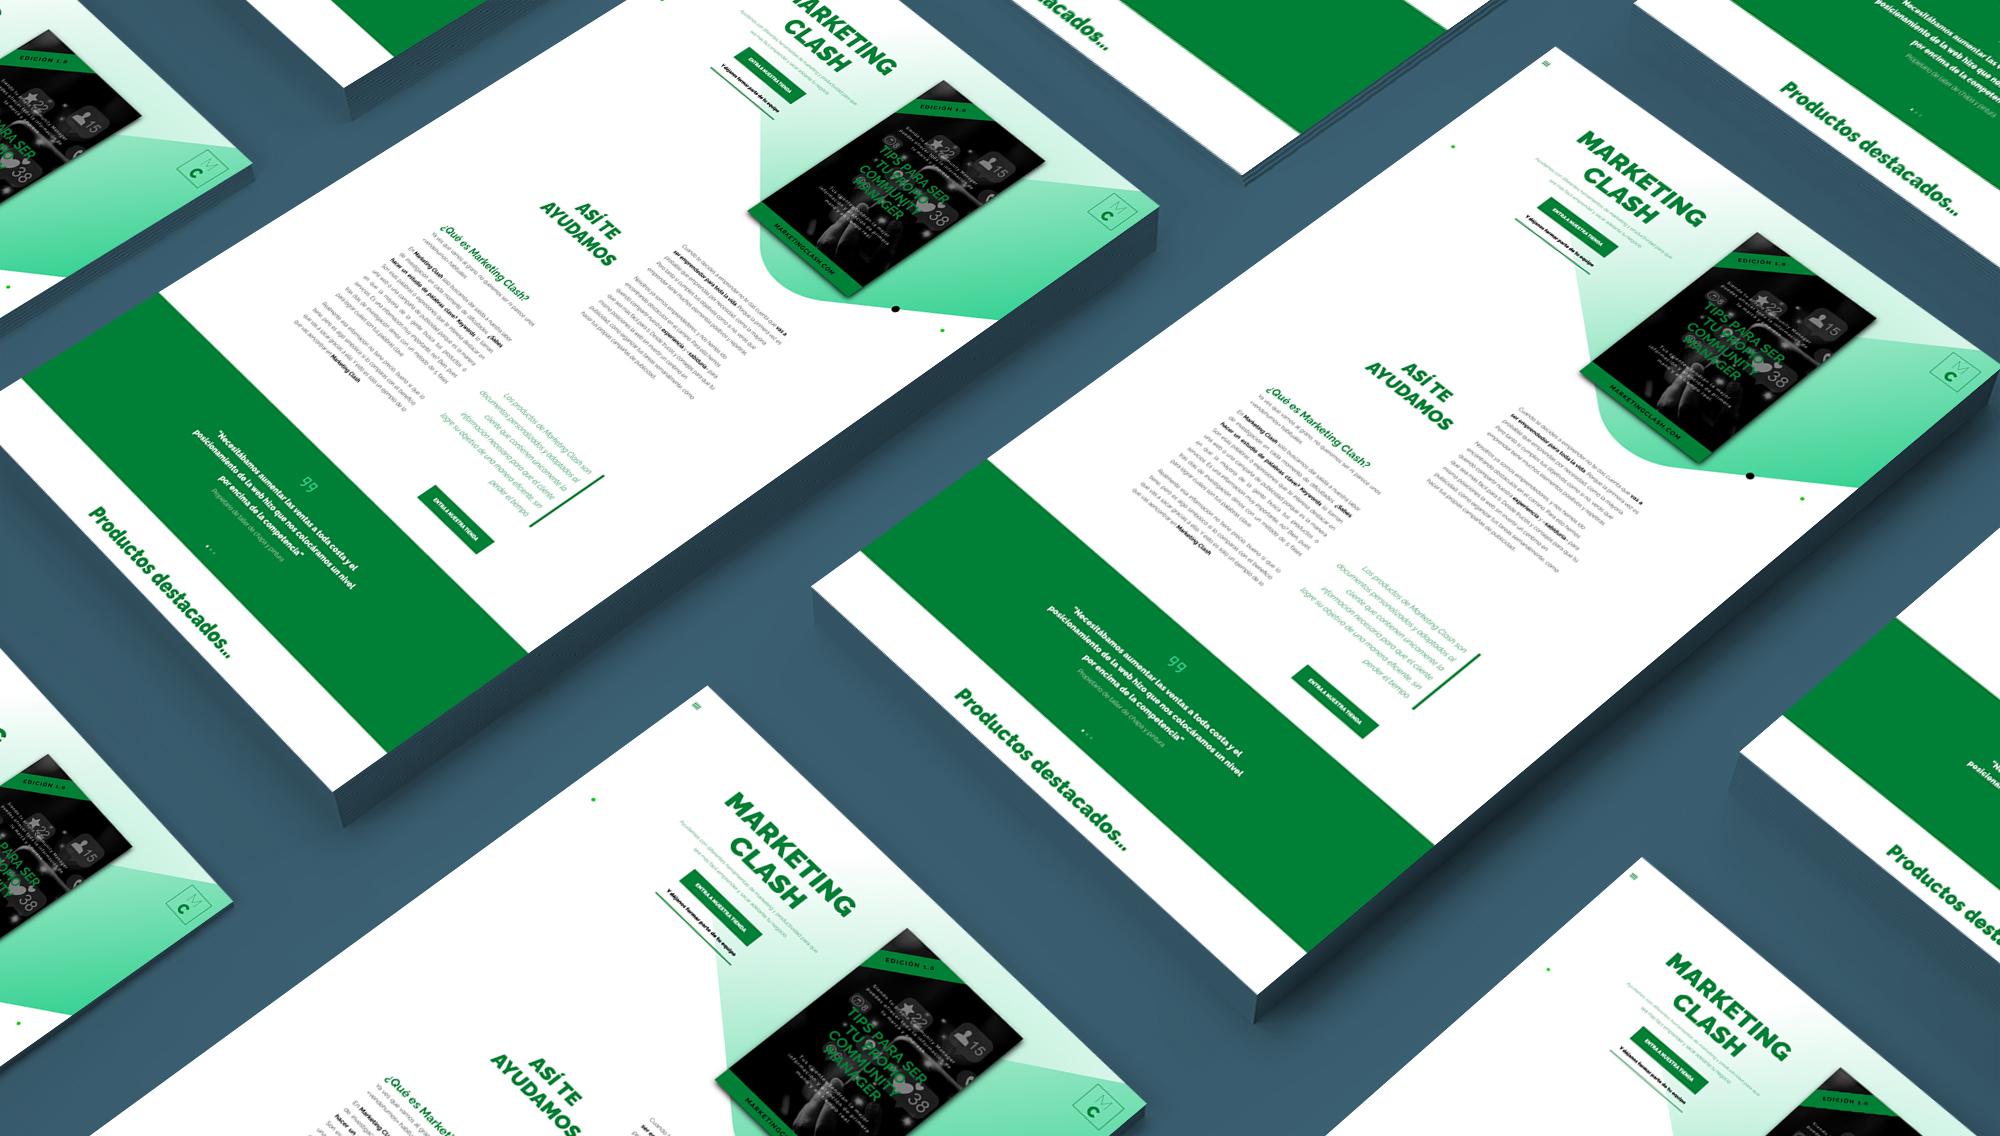 diseño-web-tienda-online-marketingclash.com-seik-3